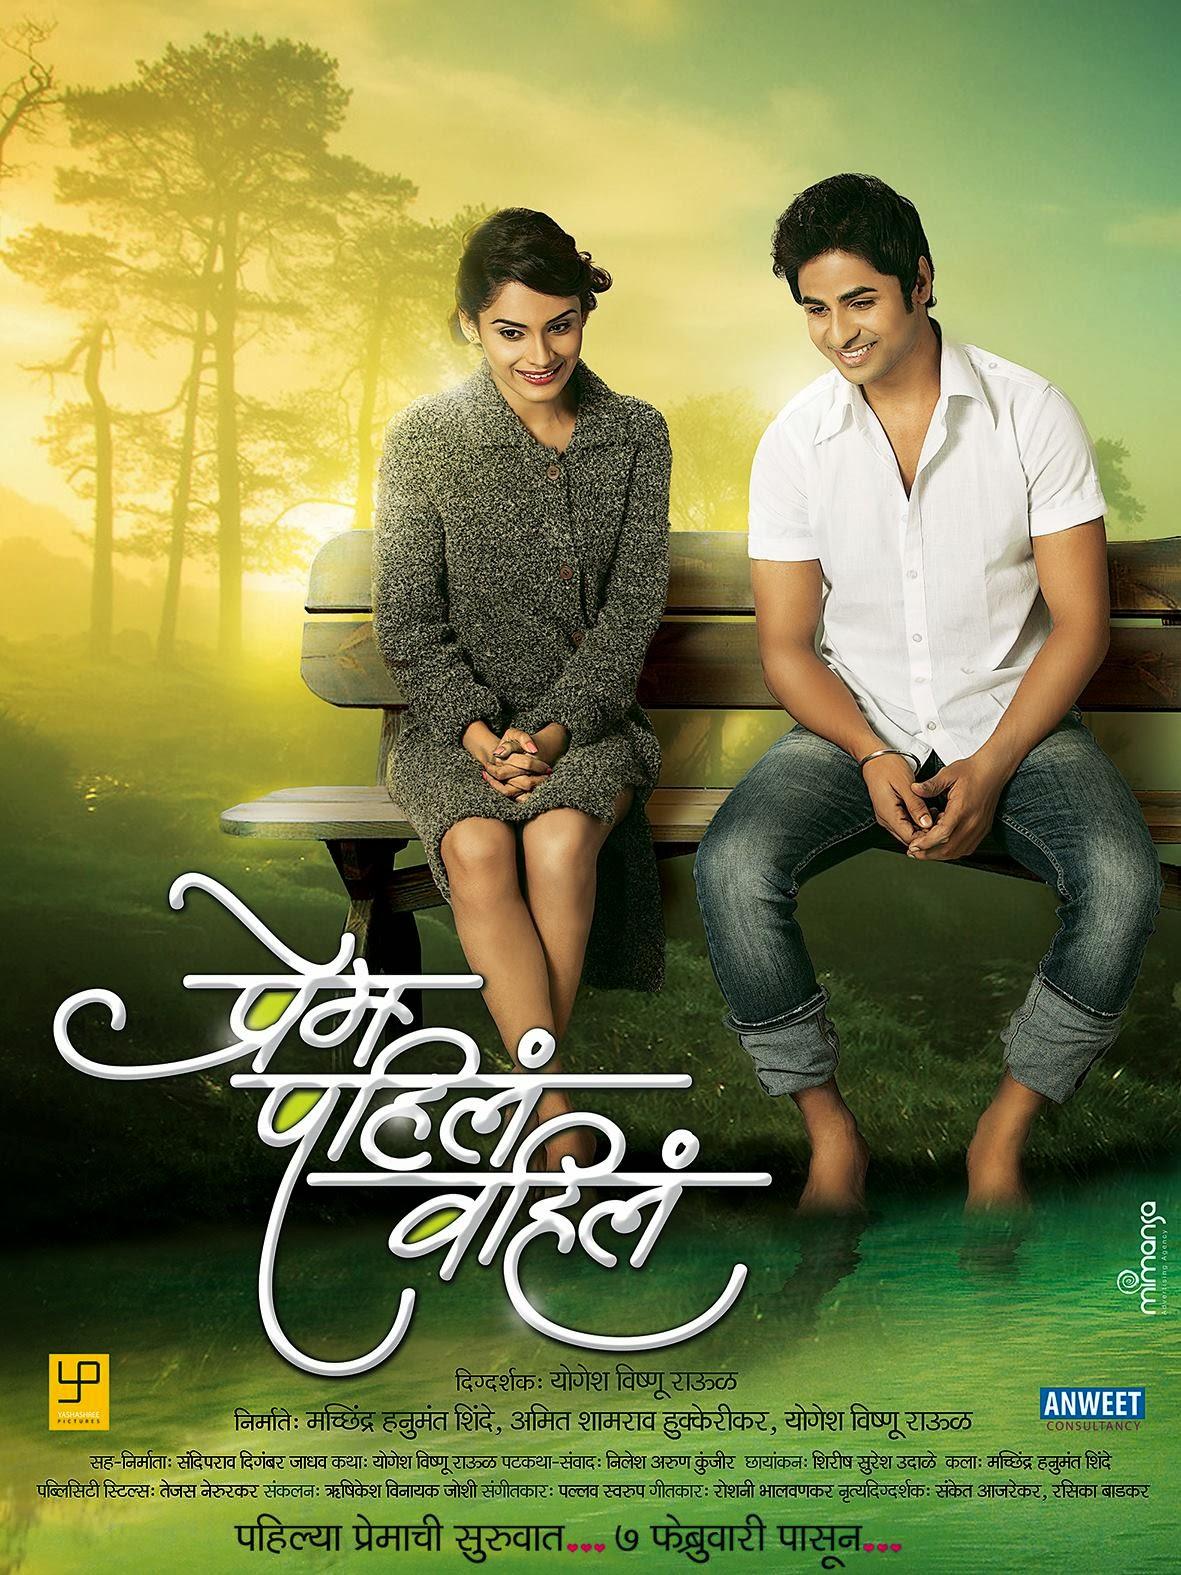 Sangharsh marathi movie songs vipmarathi - The wanted life